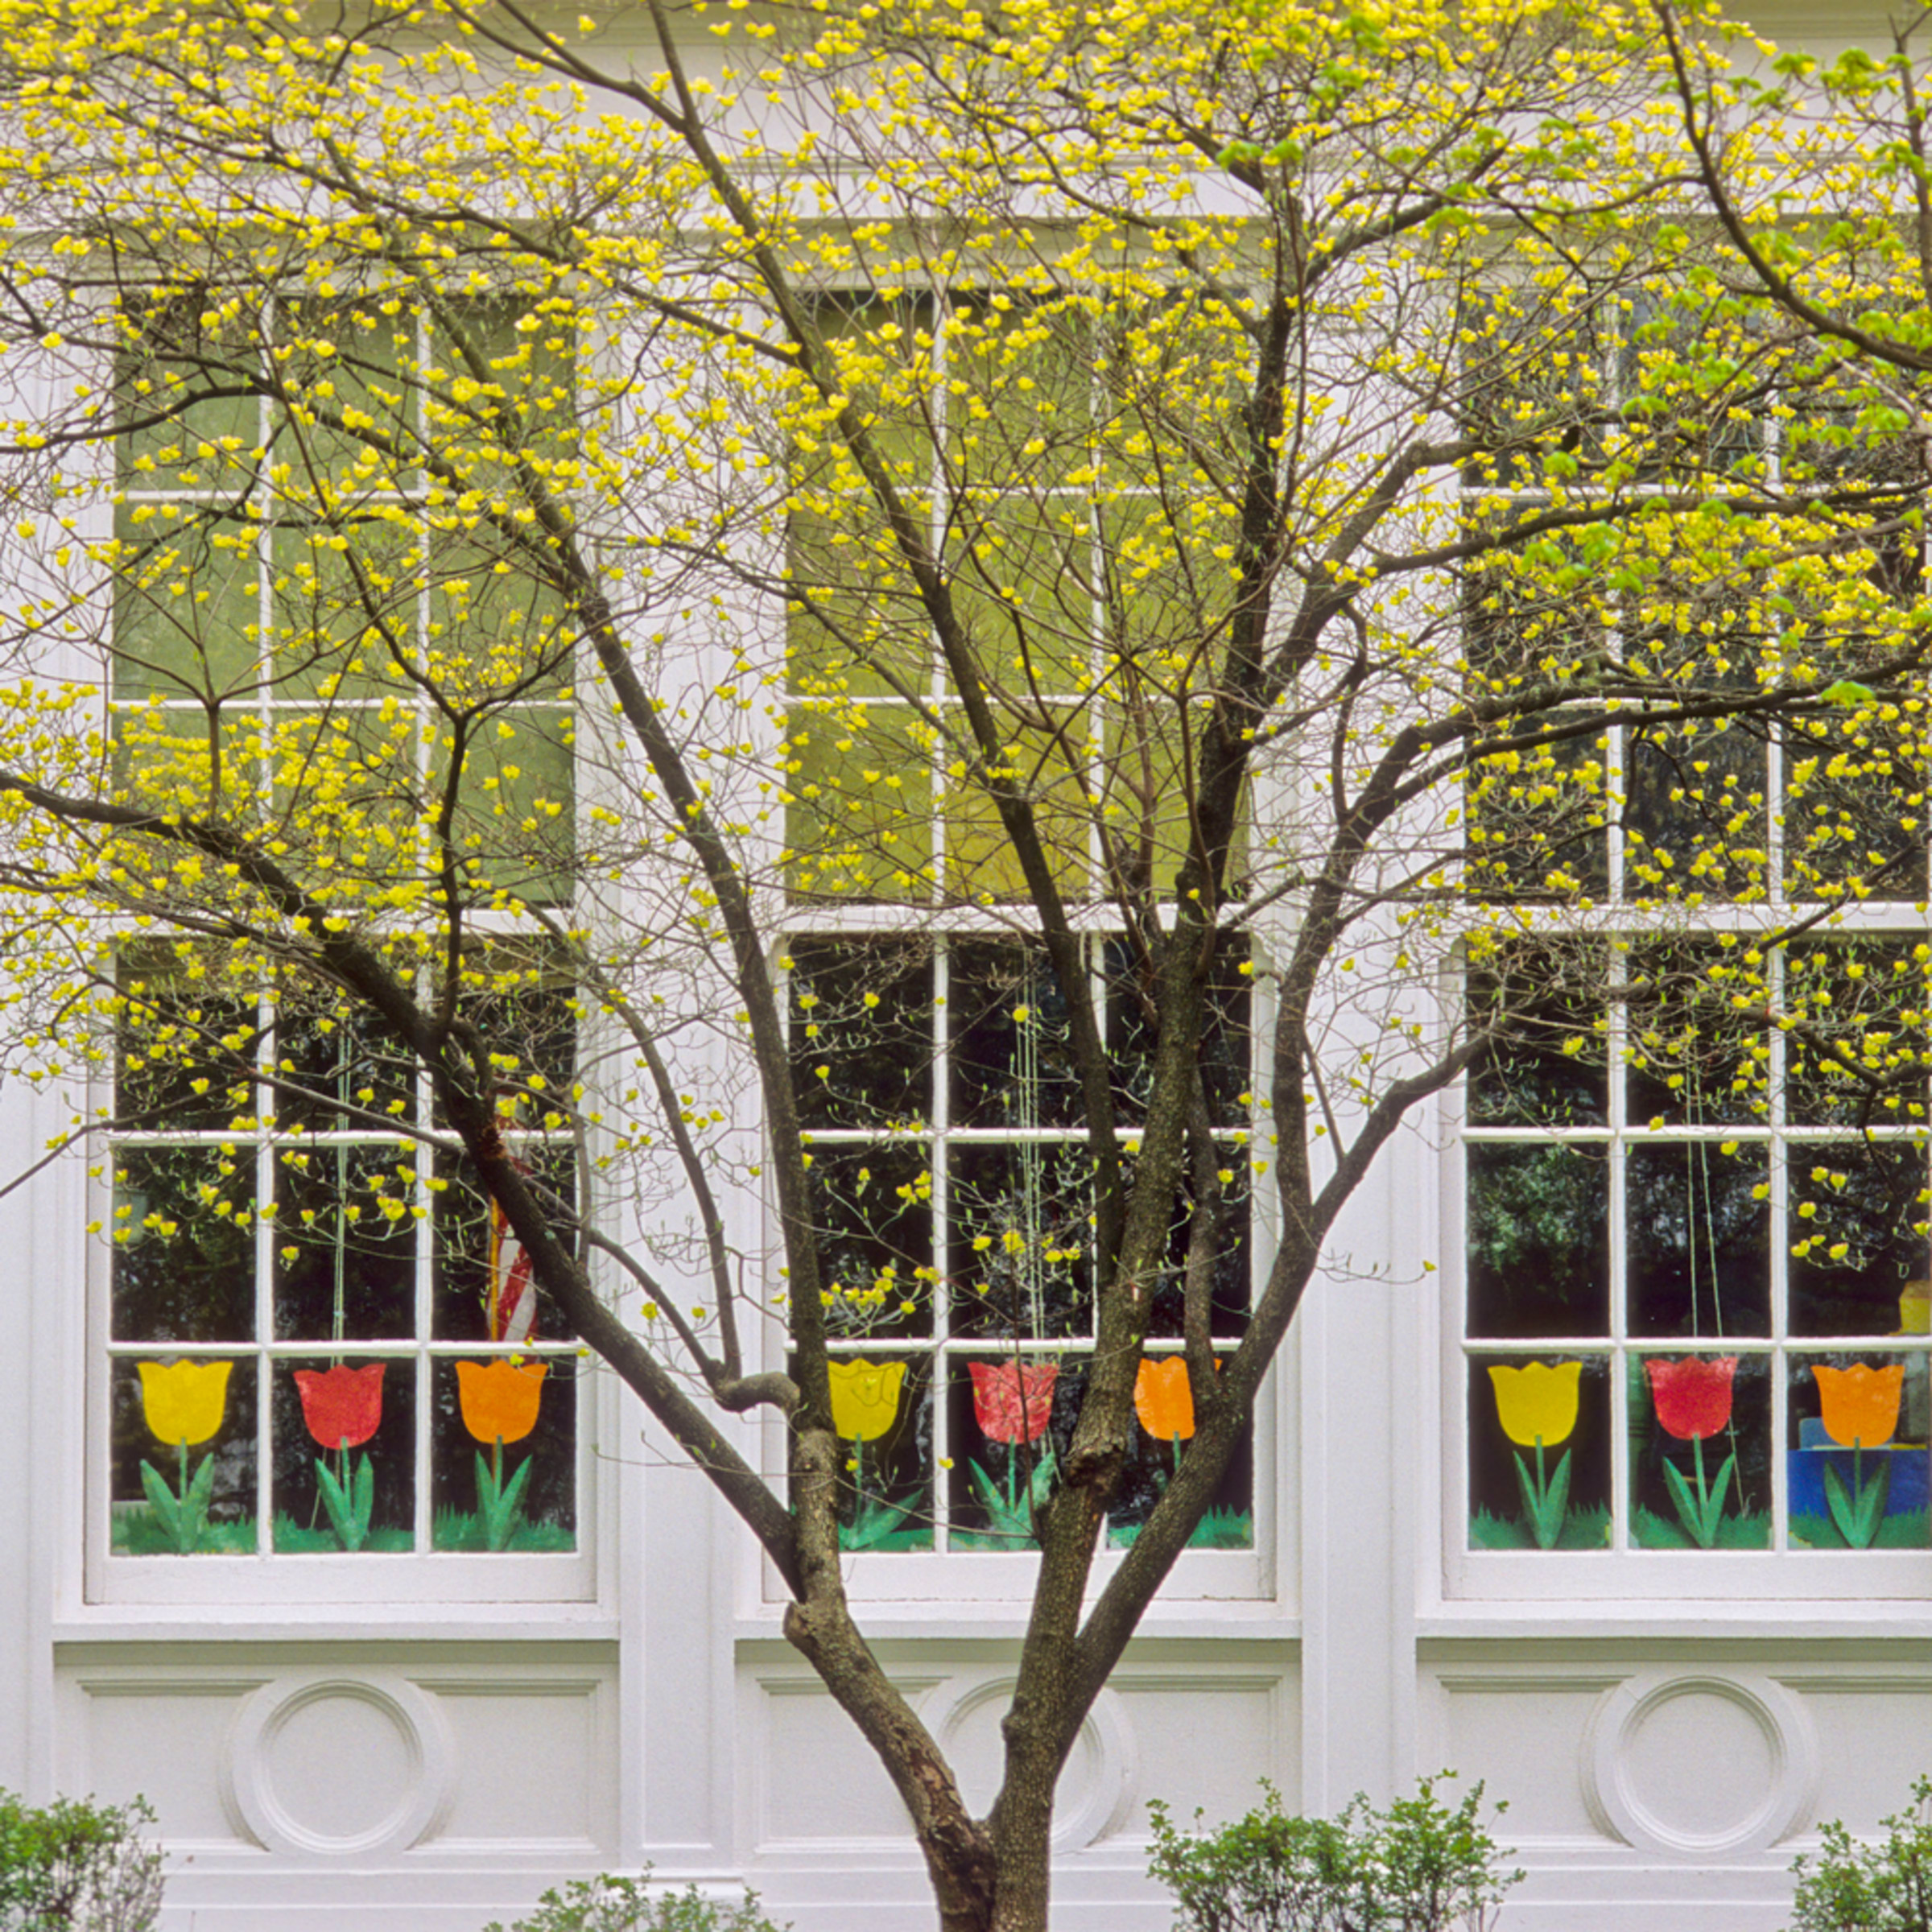 Spring windows whxaex